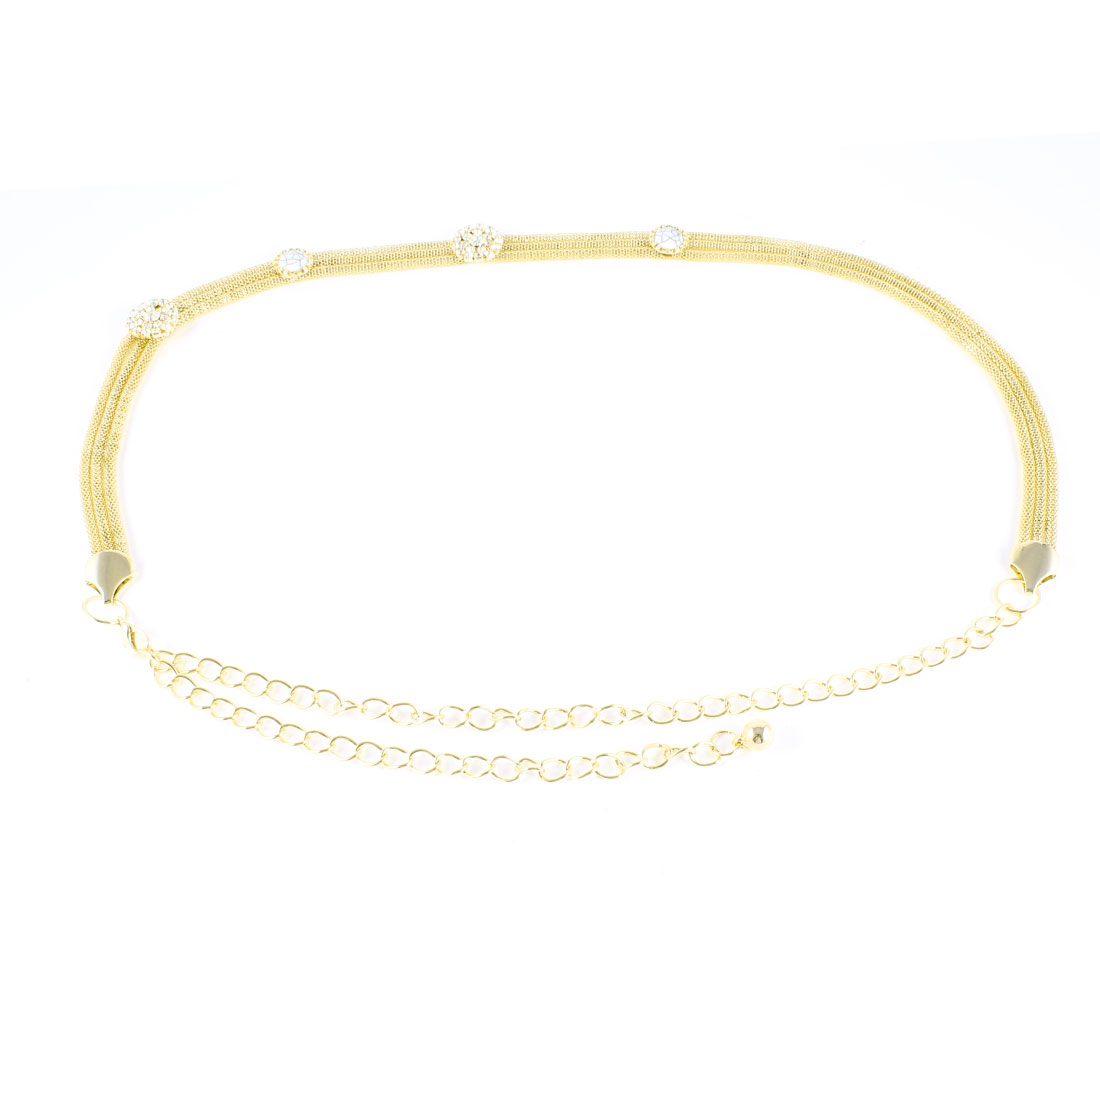 Lady Gold Tone Rhinestone Detailing Adjustable Metal Waist Chain Belt